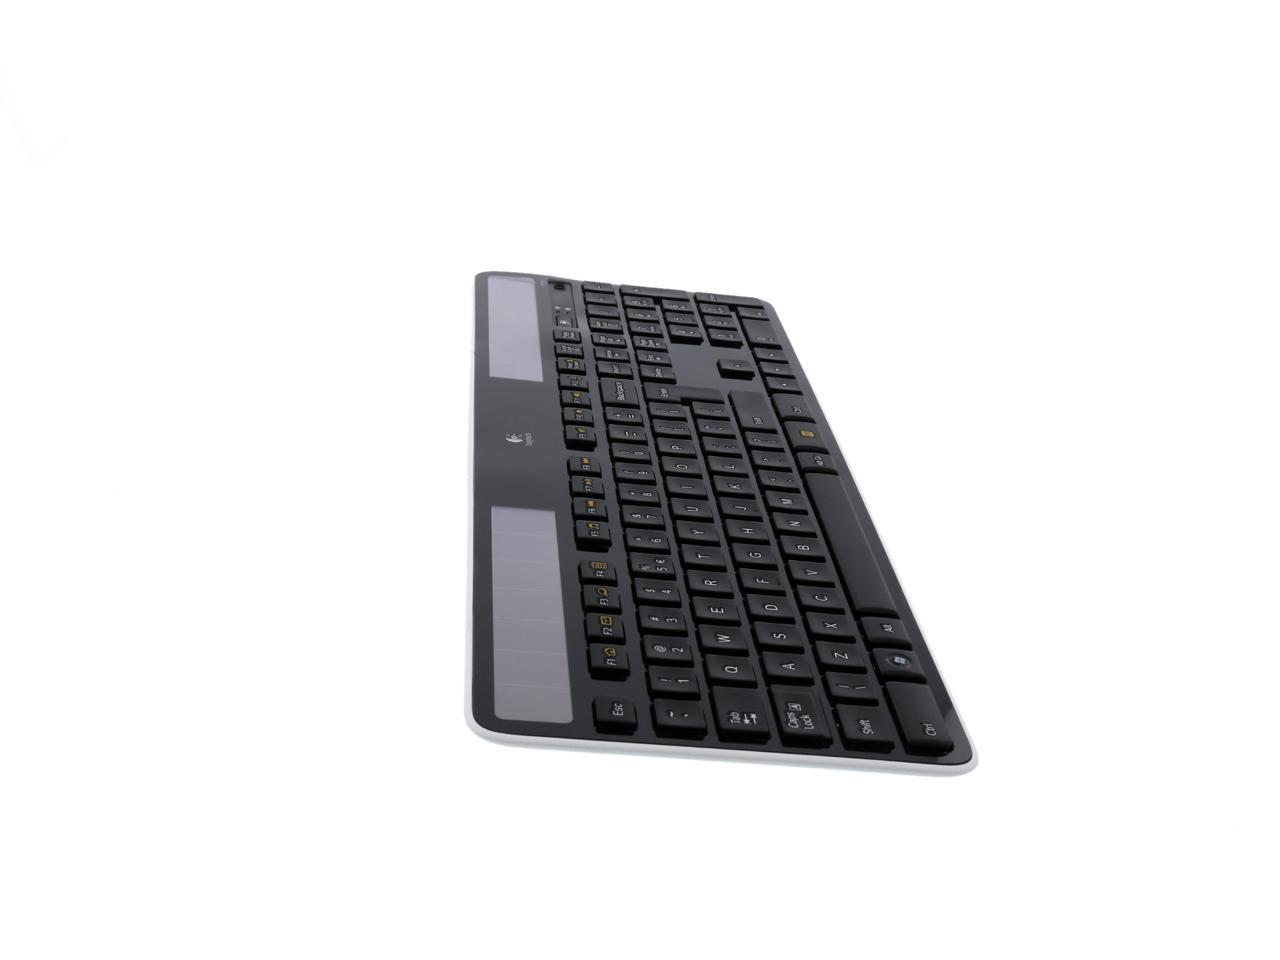 Logitech K750 2 4ghz Wireless Solar Powered Keyboard Black Newegg Com